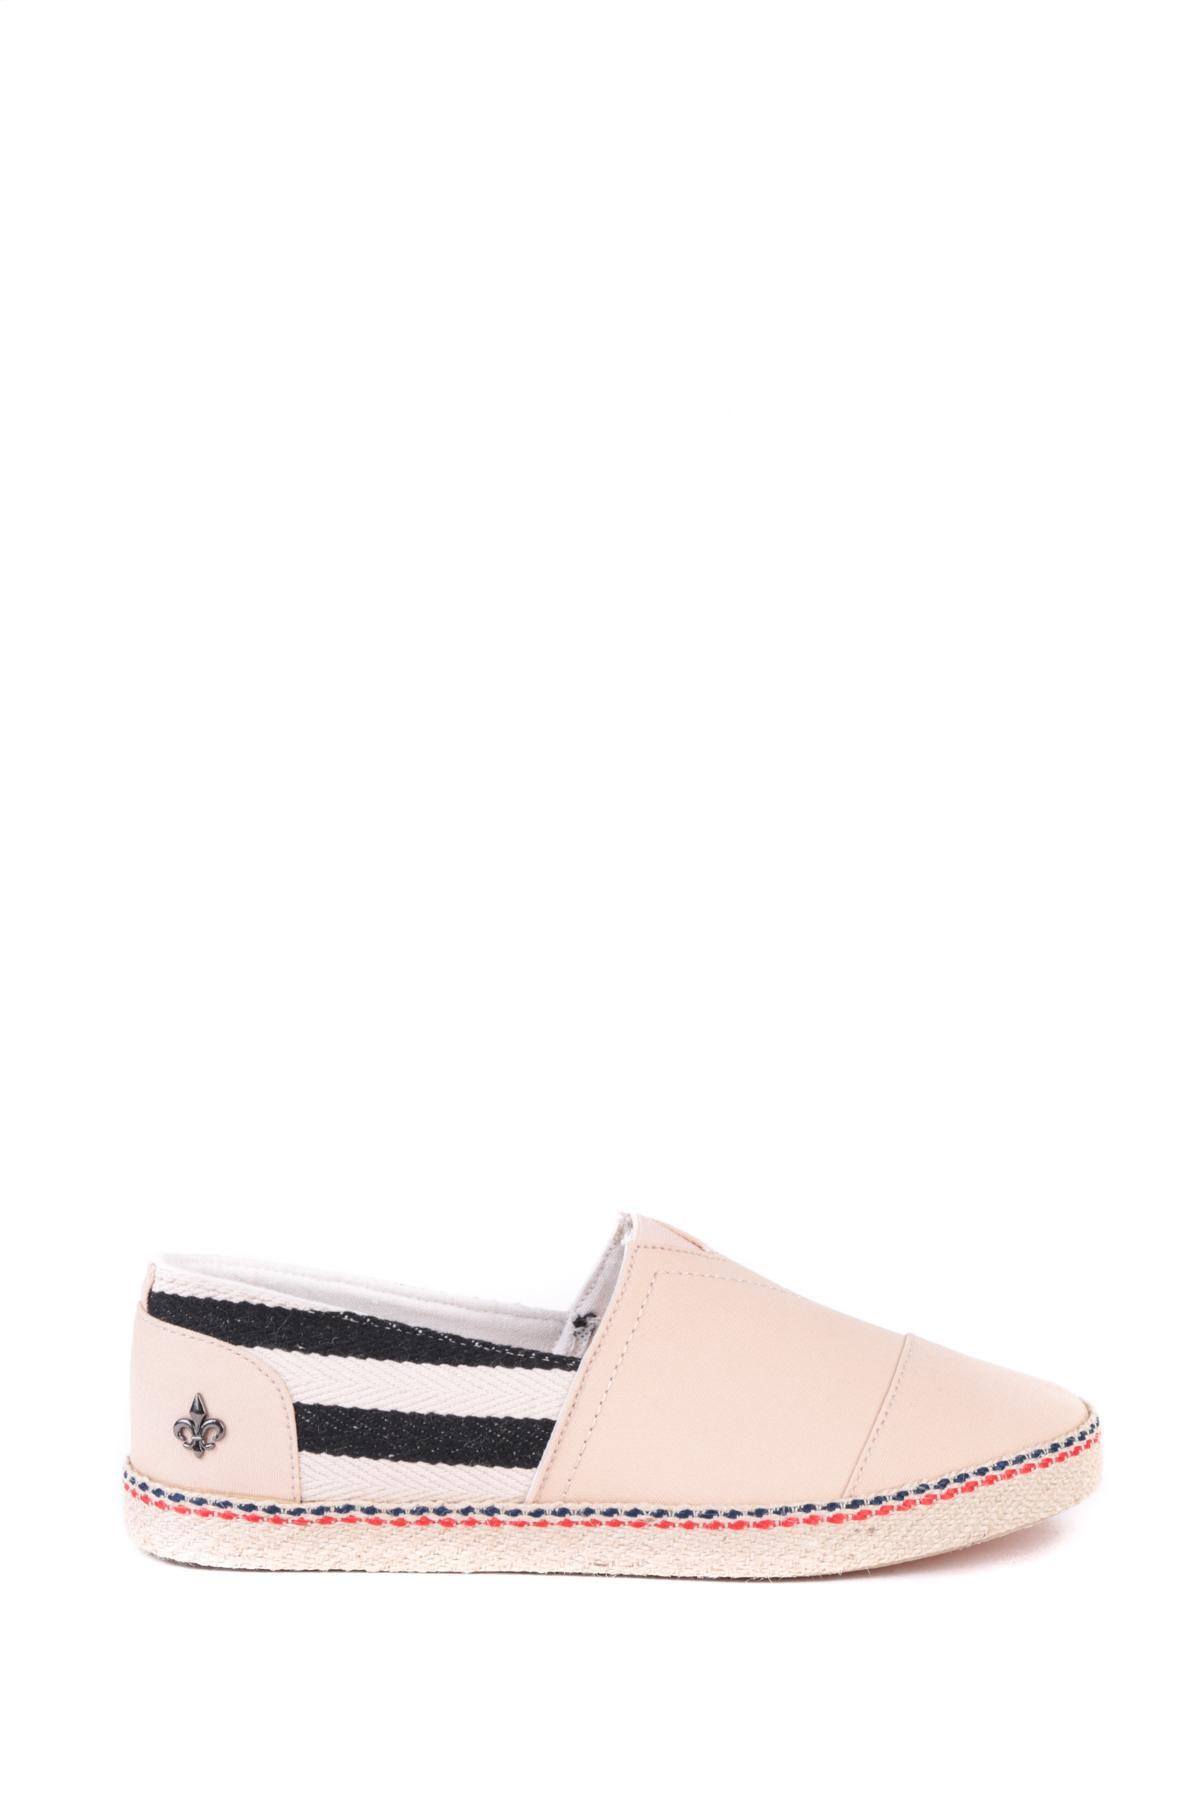 Espadrilles Chaussures Beige Galax PAYNE BS716 FEMME #c eFashion Paris